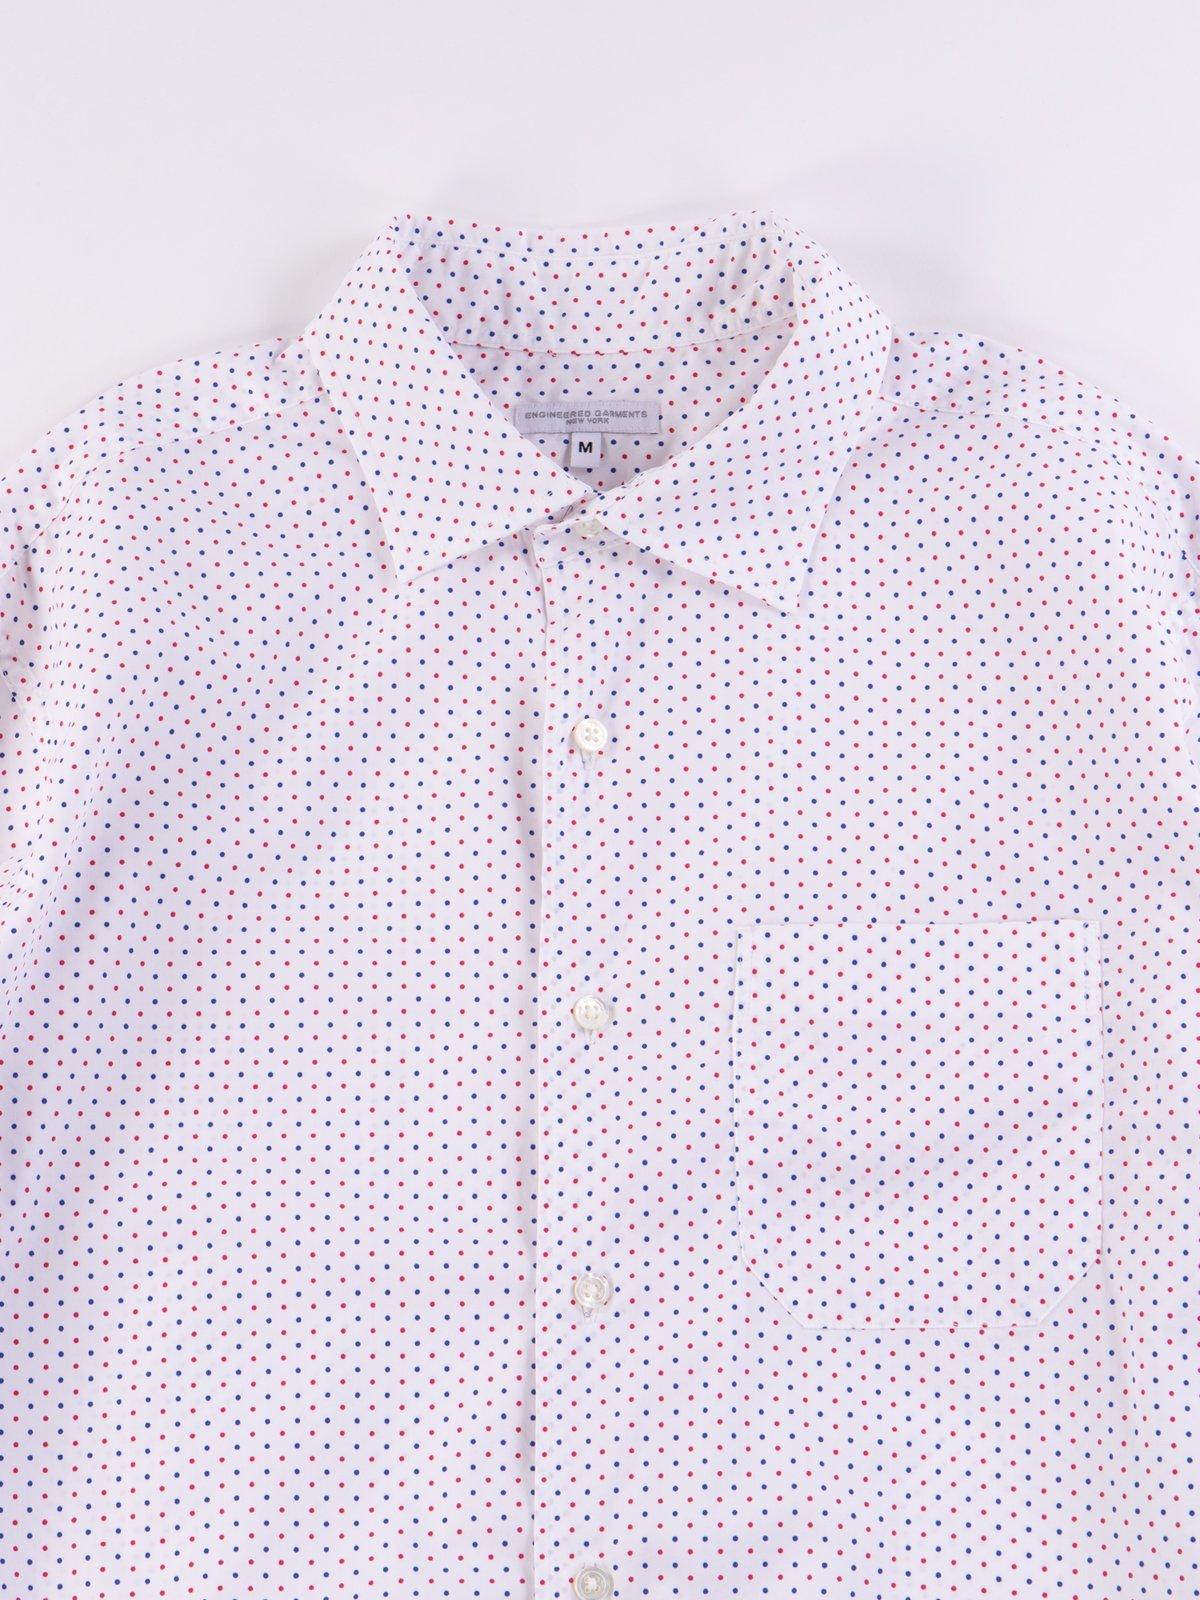 Red/Navy Small Polka Dot Spread Collar Shirt - Image 4